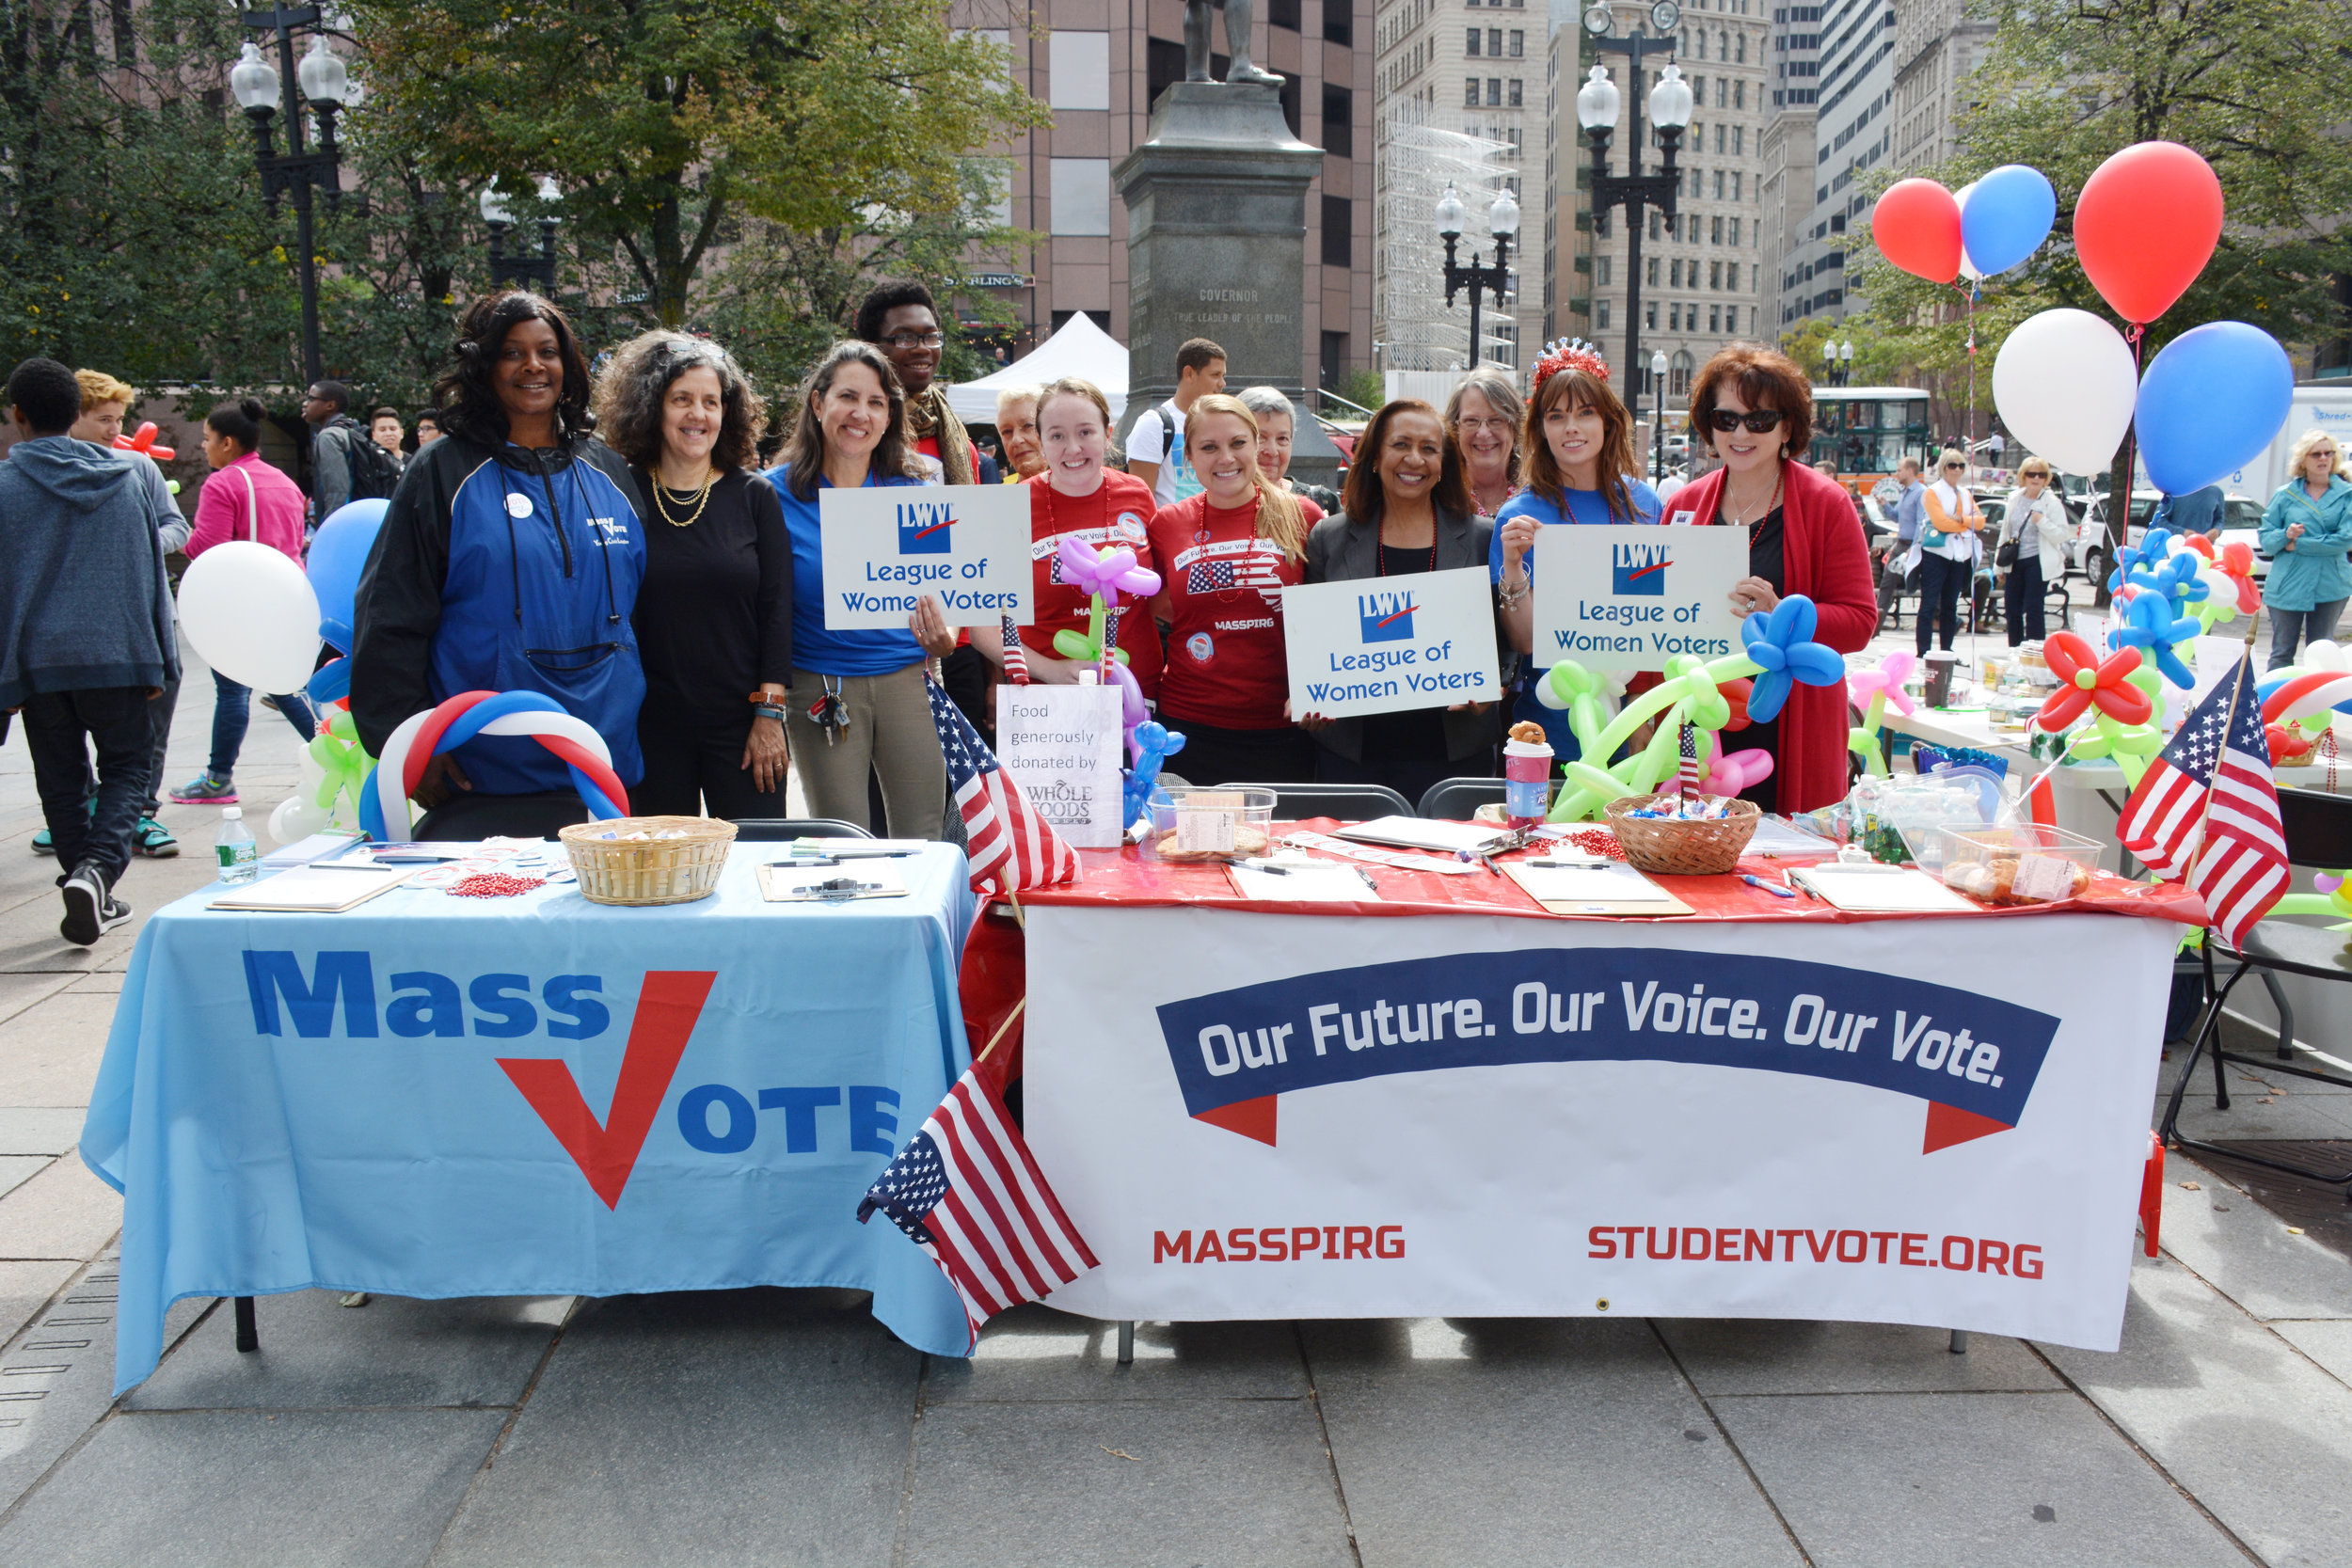 MassVOTE and MassPIRG jointly register voters.